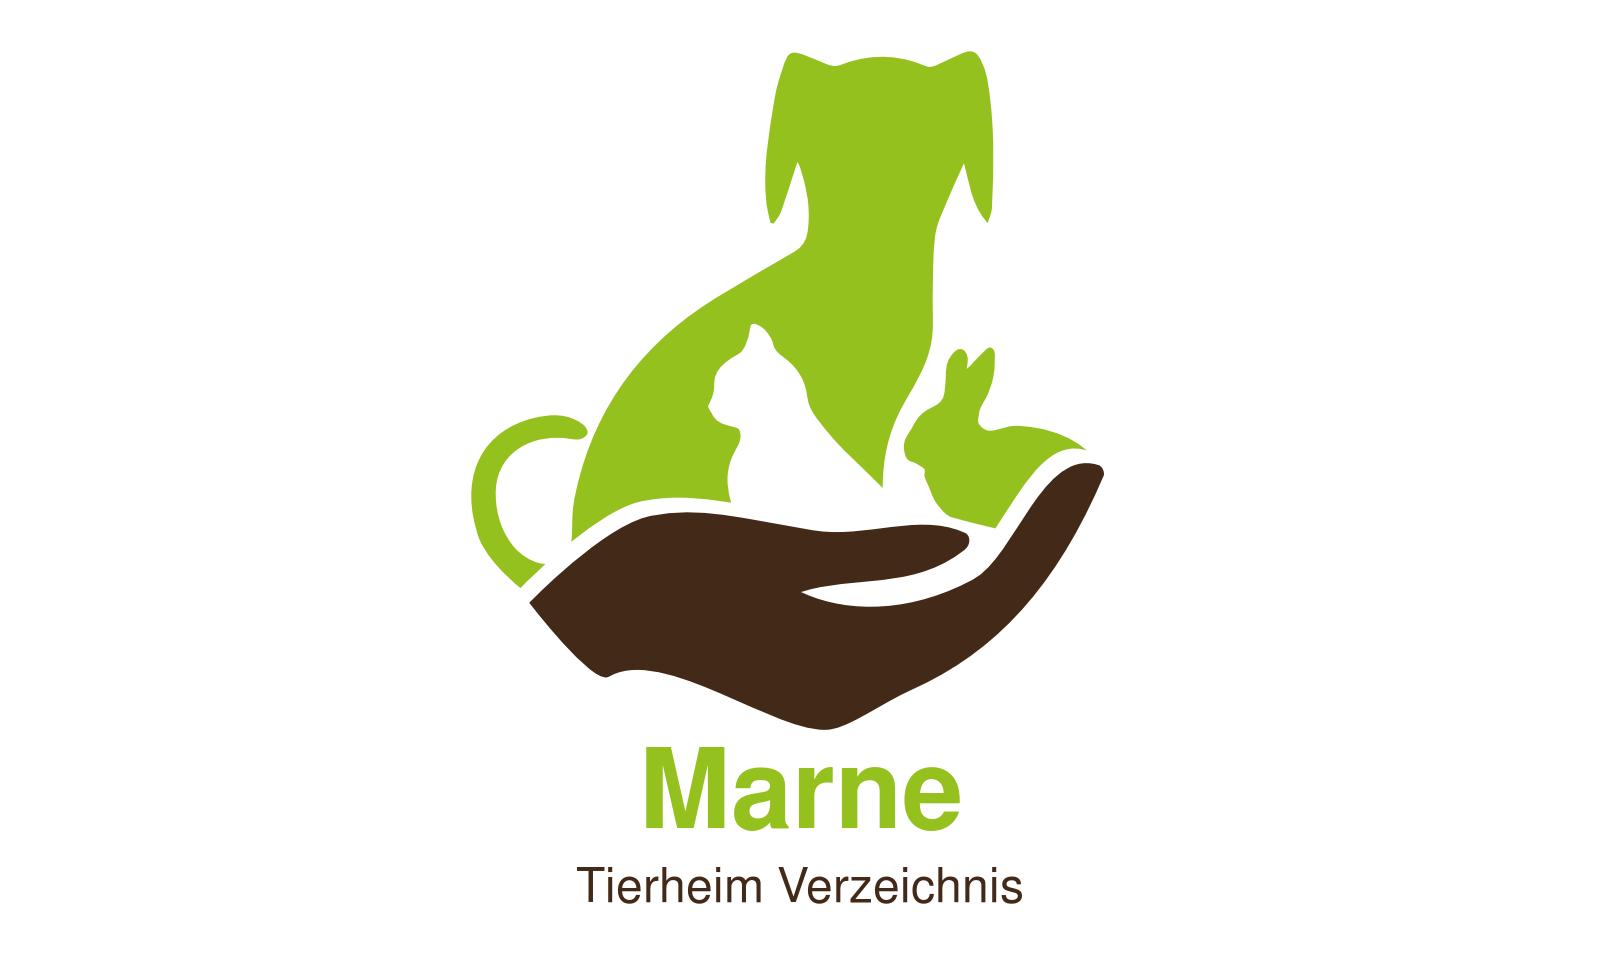 Tierheim Marne